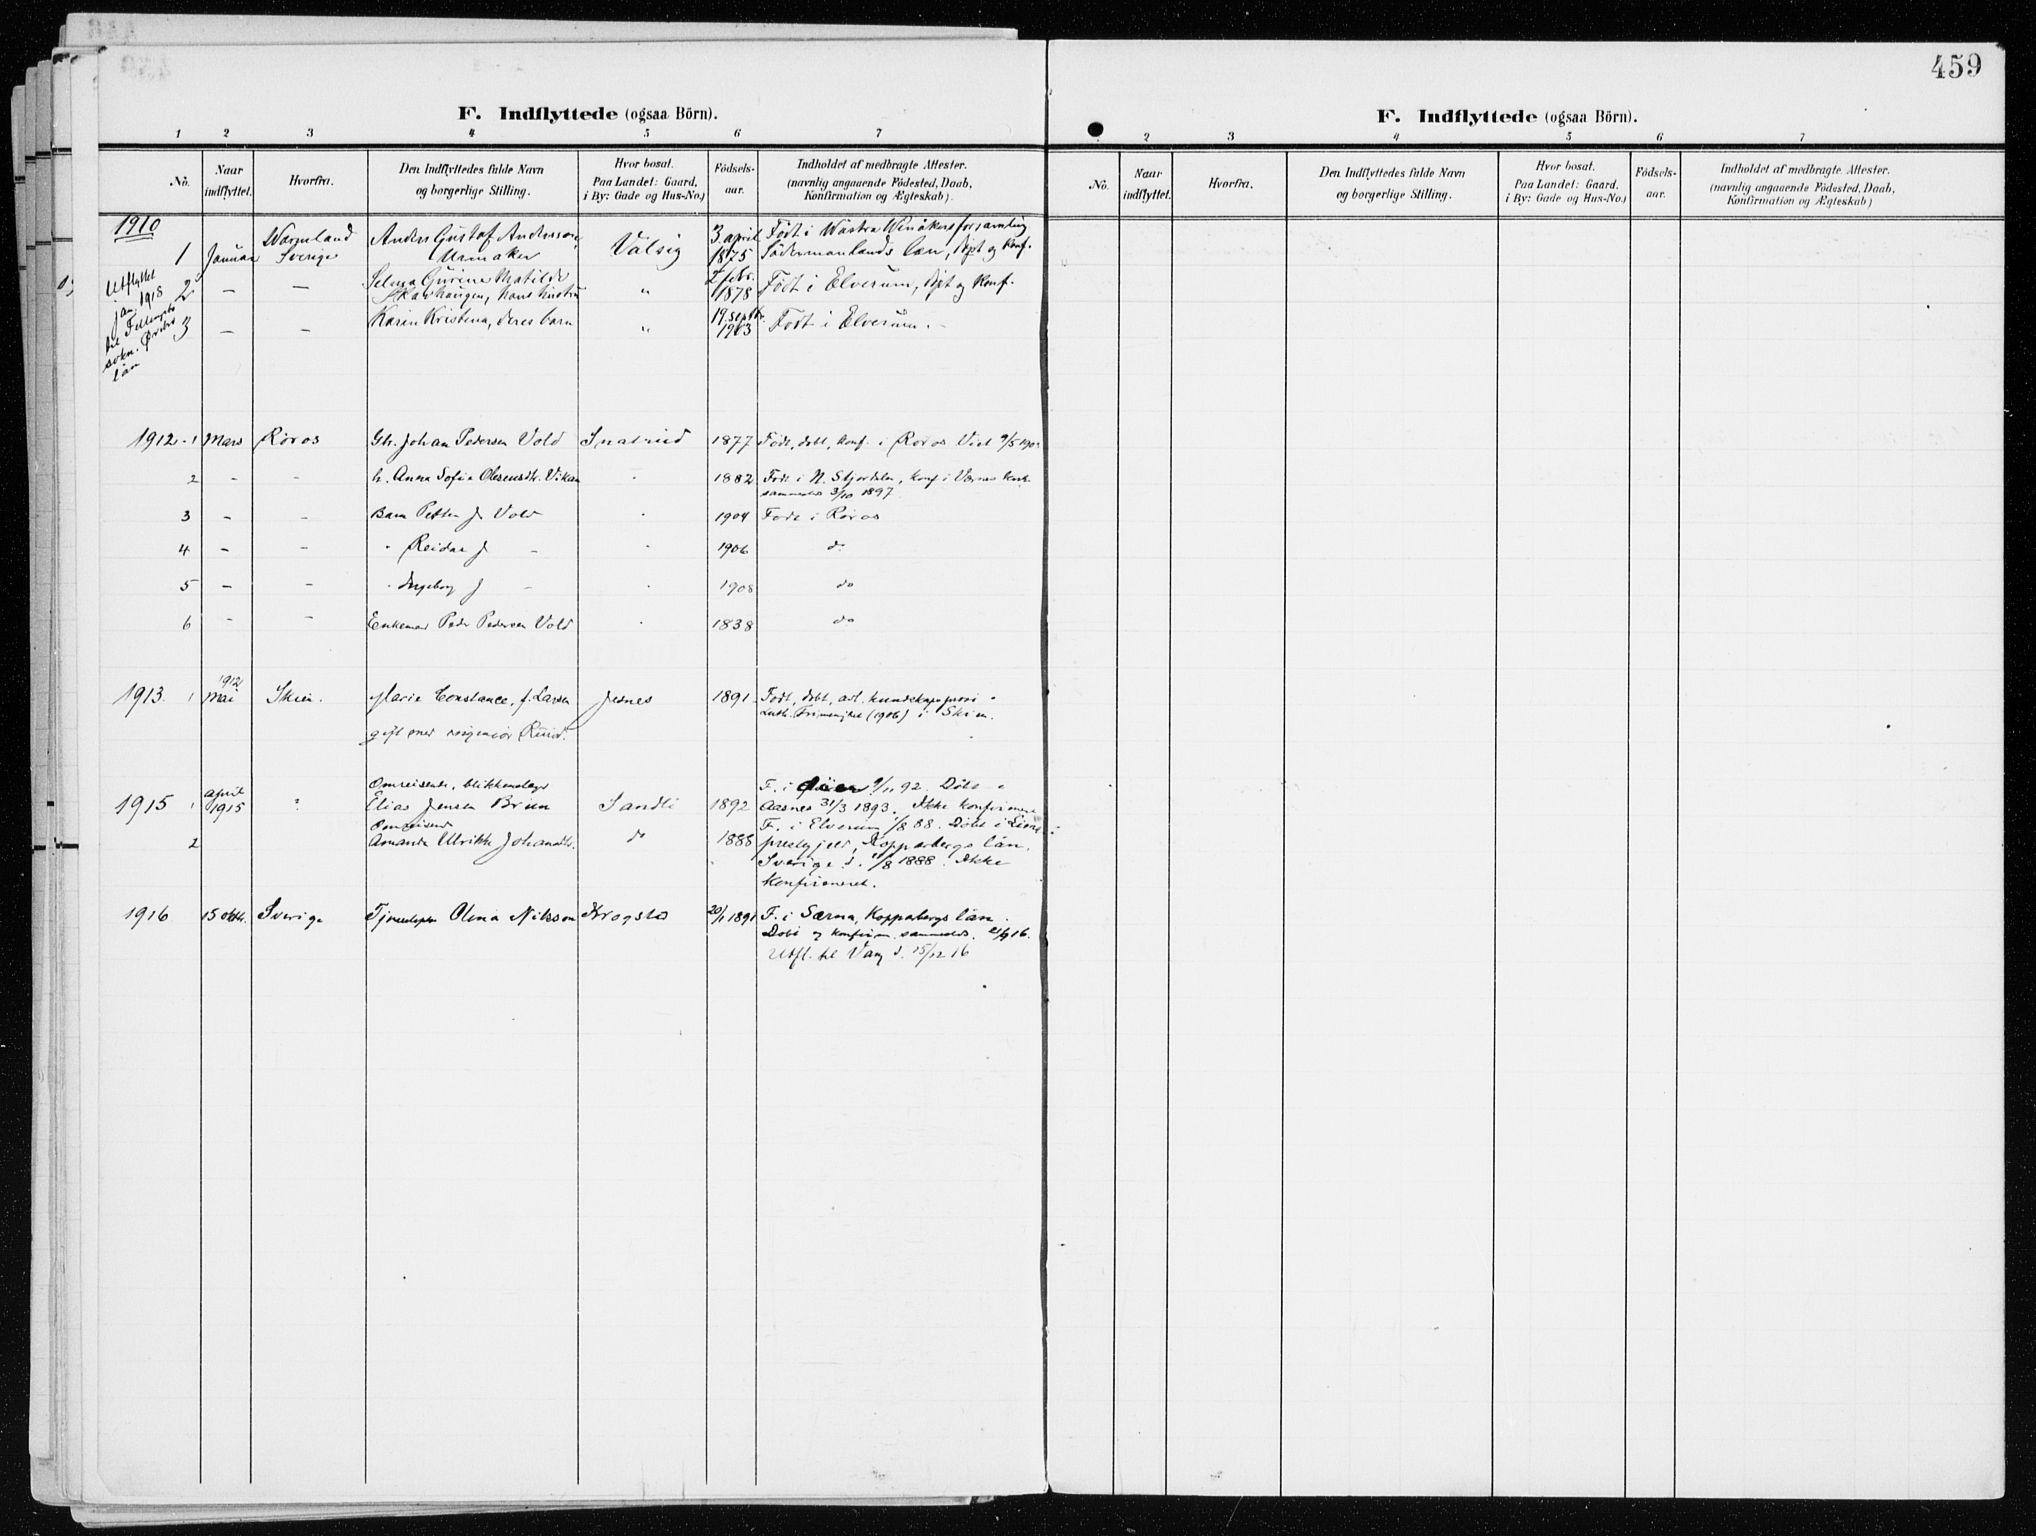 SAH, Furnes prestekontor, K/Ka/L0001: Ministerialbok nr. 1, 1907-1935, s. 459